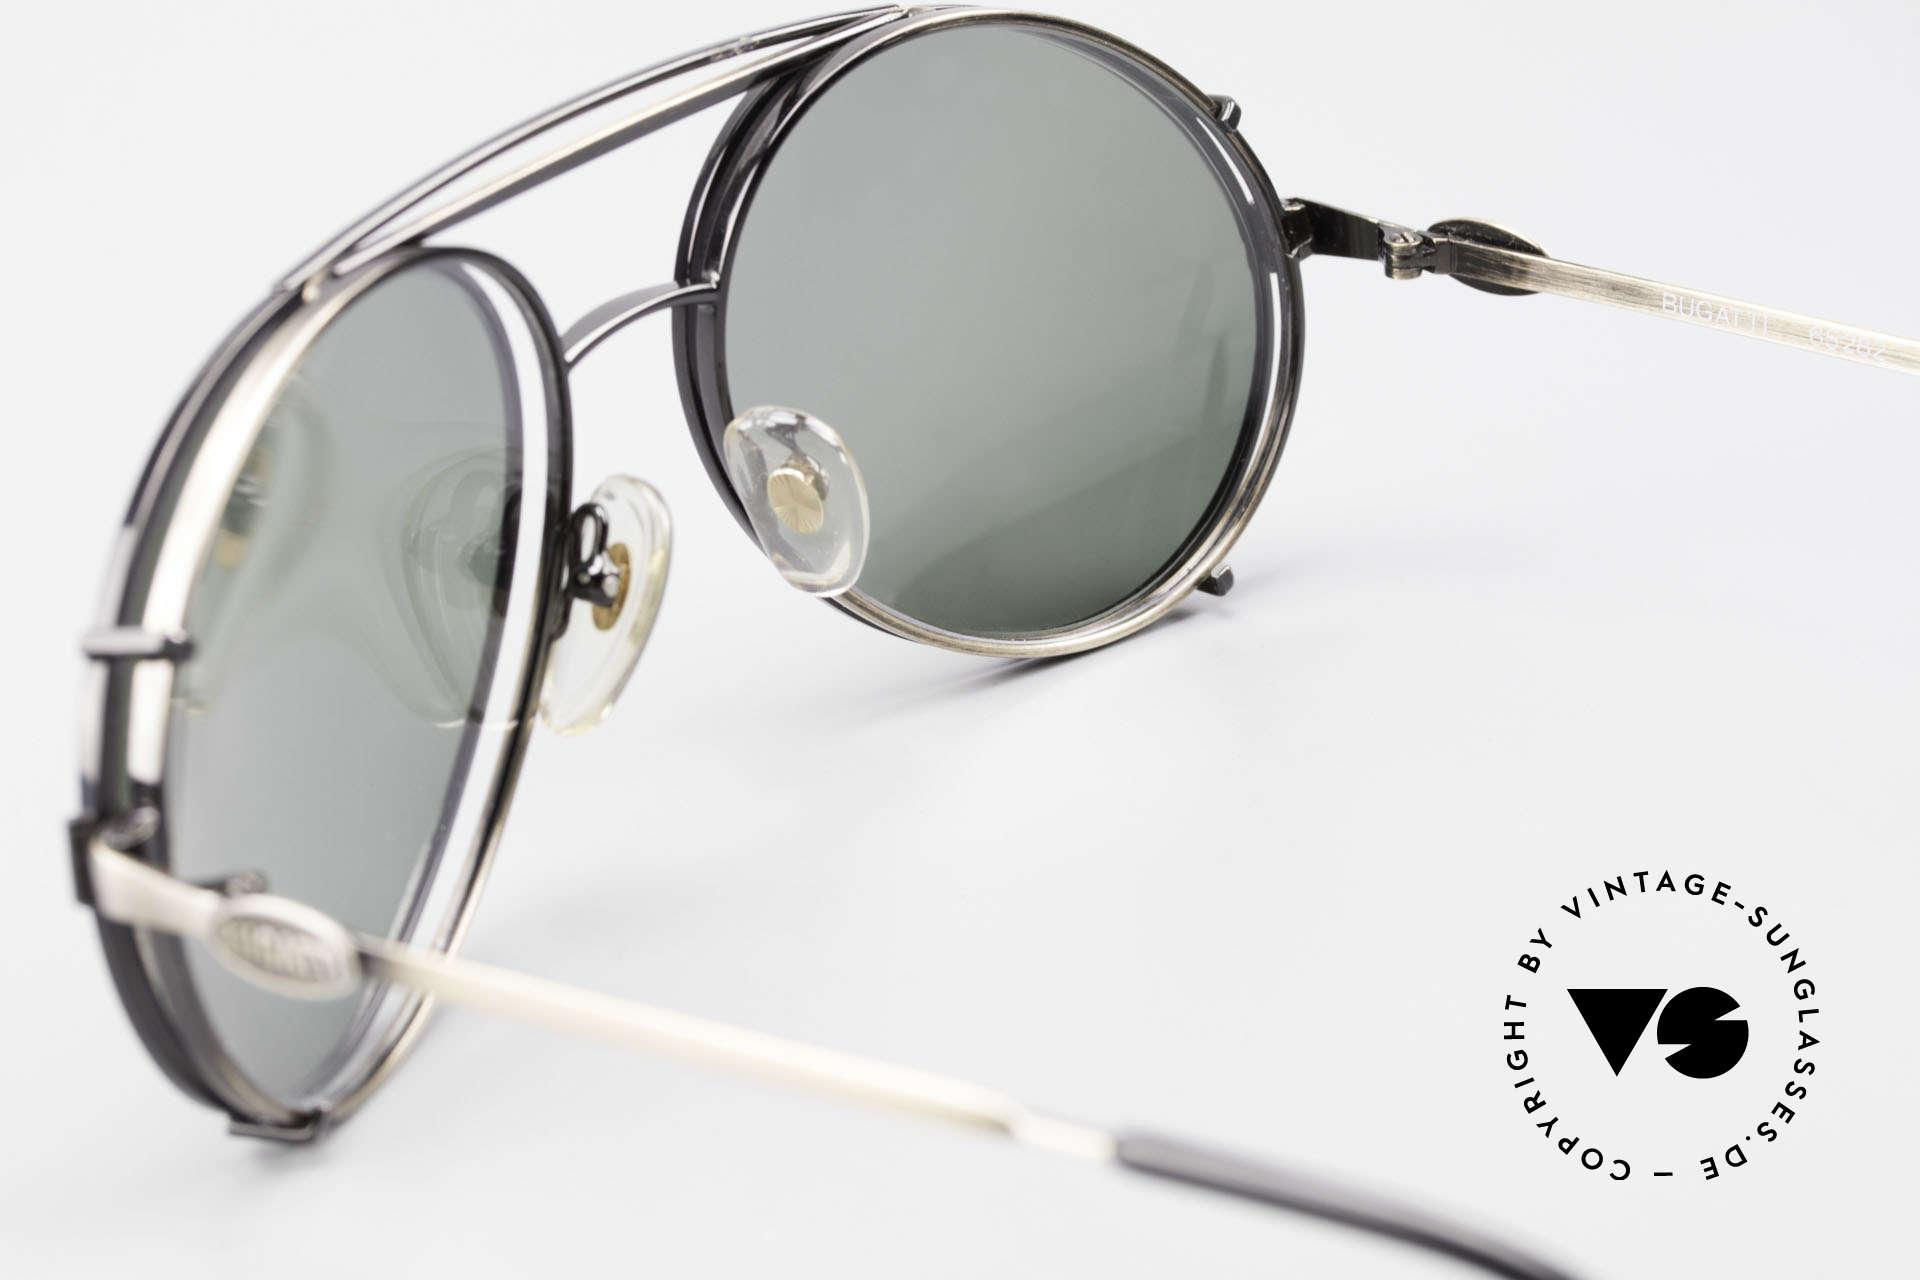 Bugatti 65282 Vintage Men's Glasses 1980's, unworn; like all our vintage Bugatti sunglasses, Made for Men